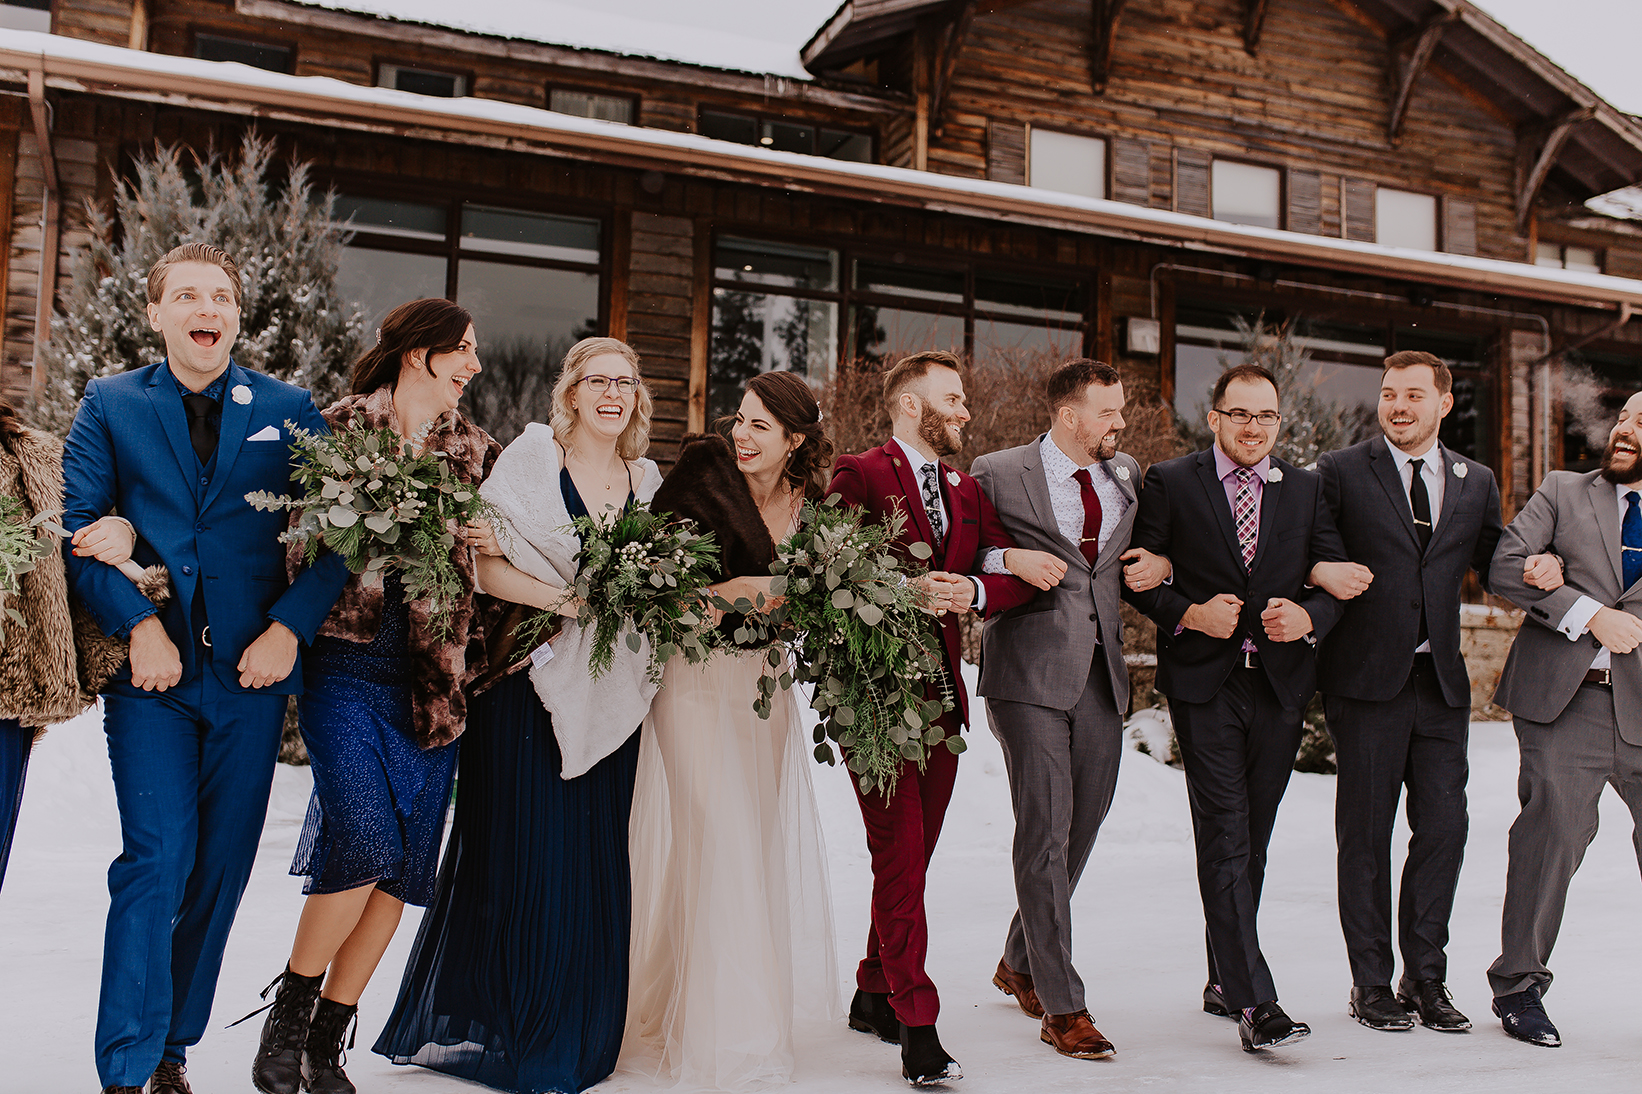 Wedding_Party_Formals_84_web.jpg